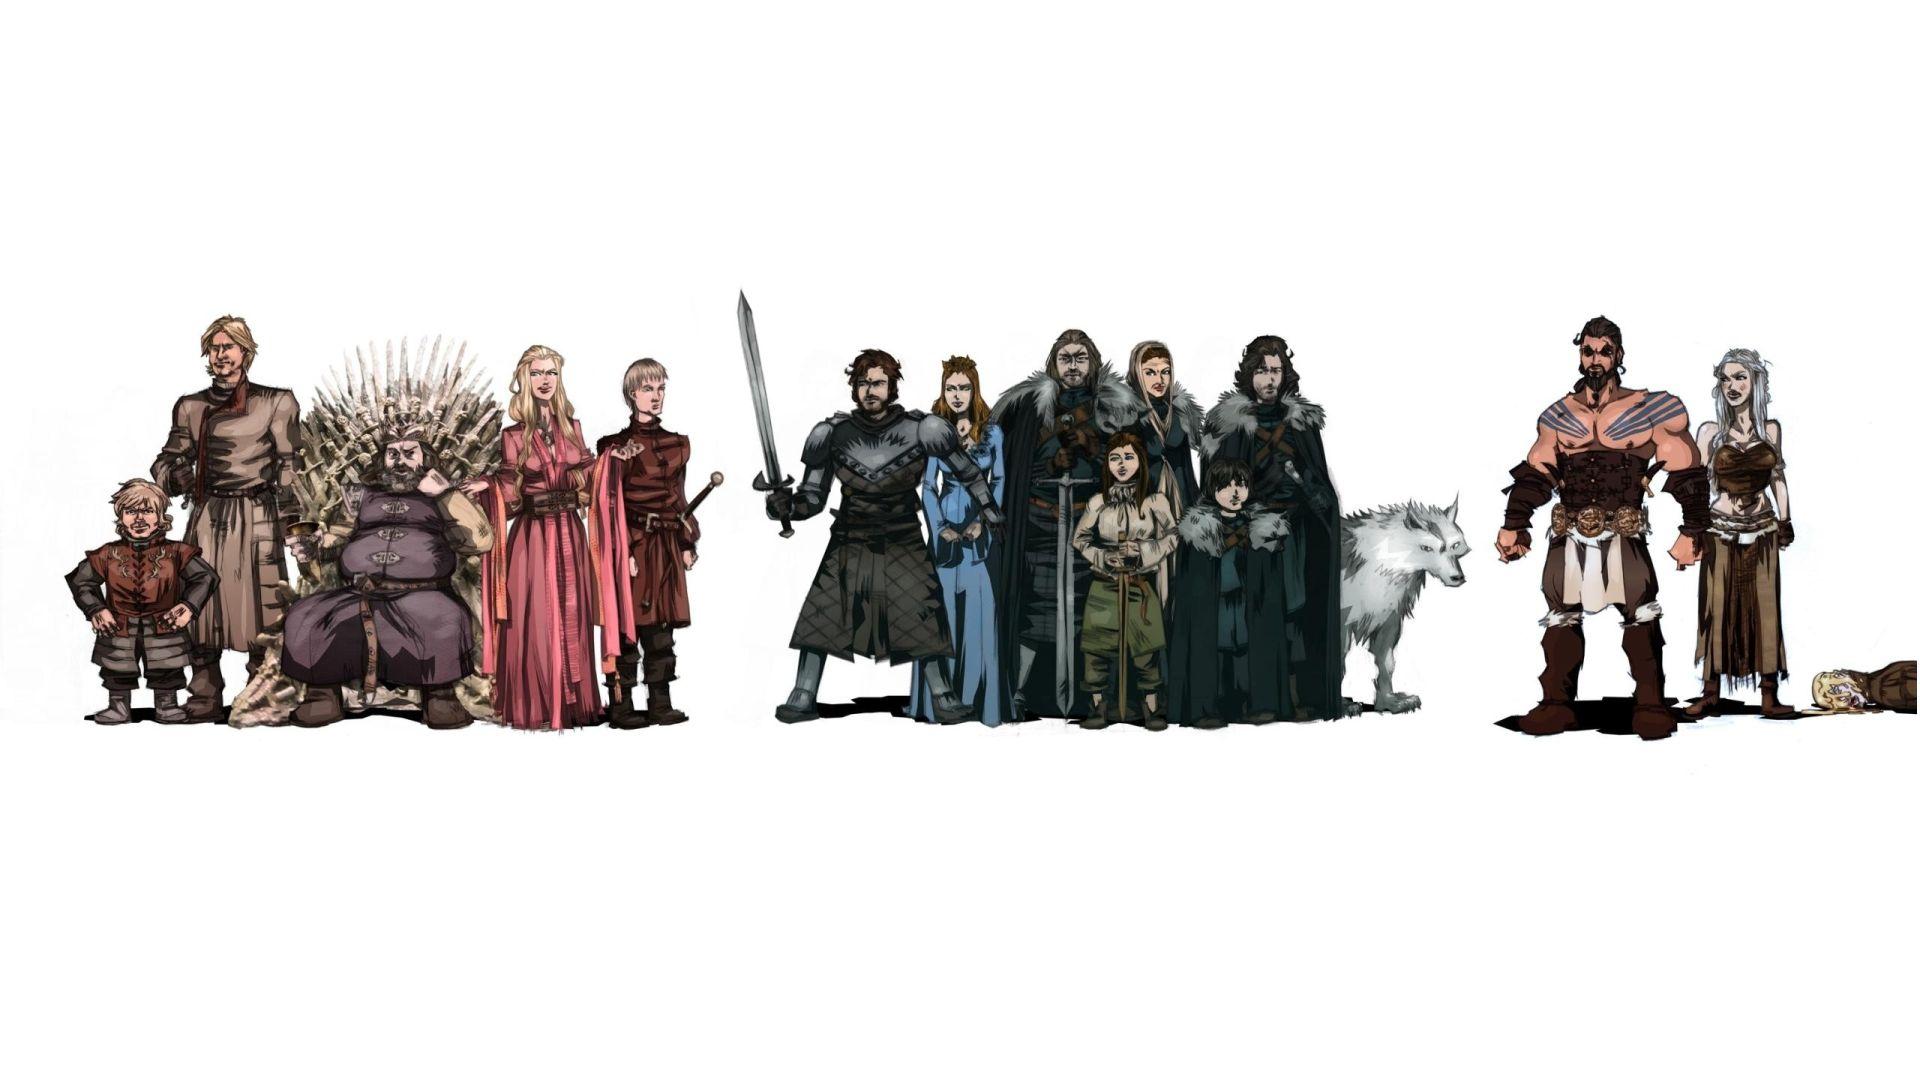 Game of Thrones fan art people